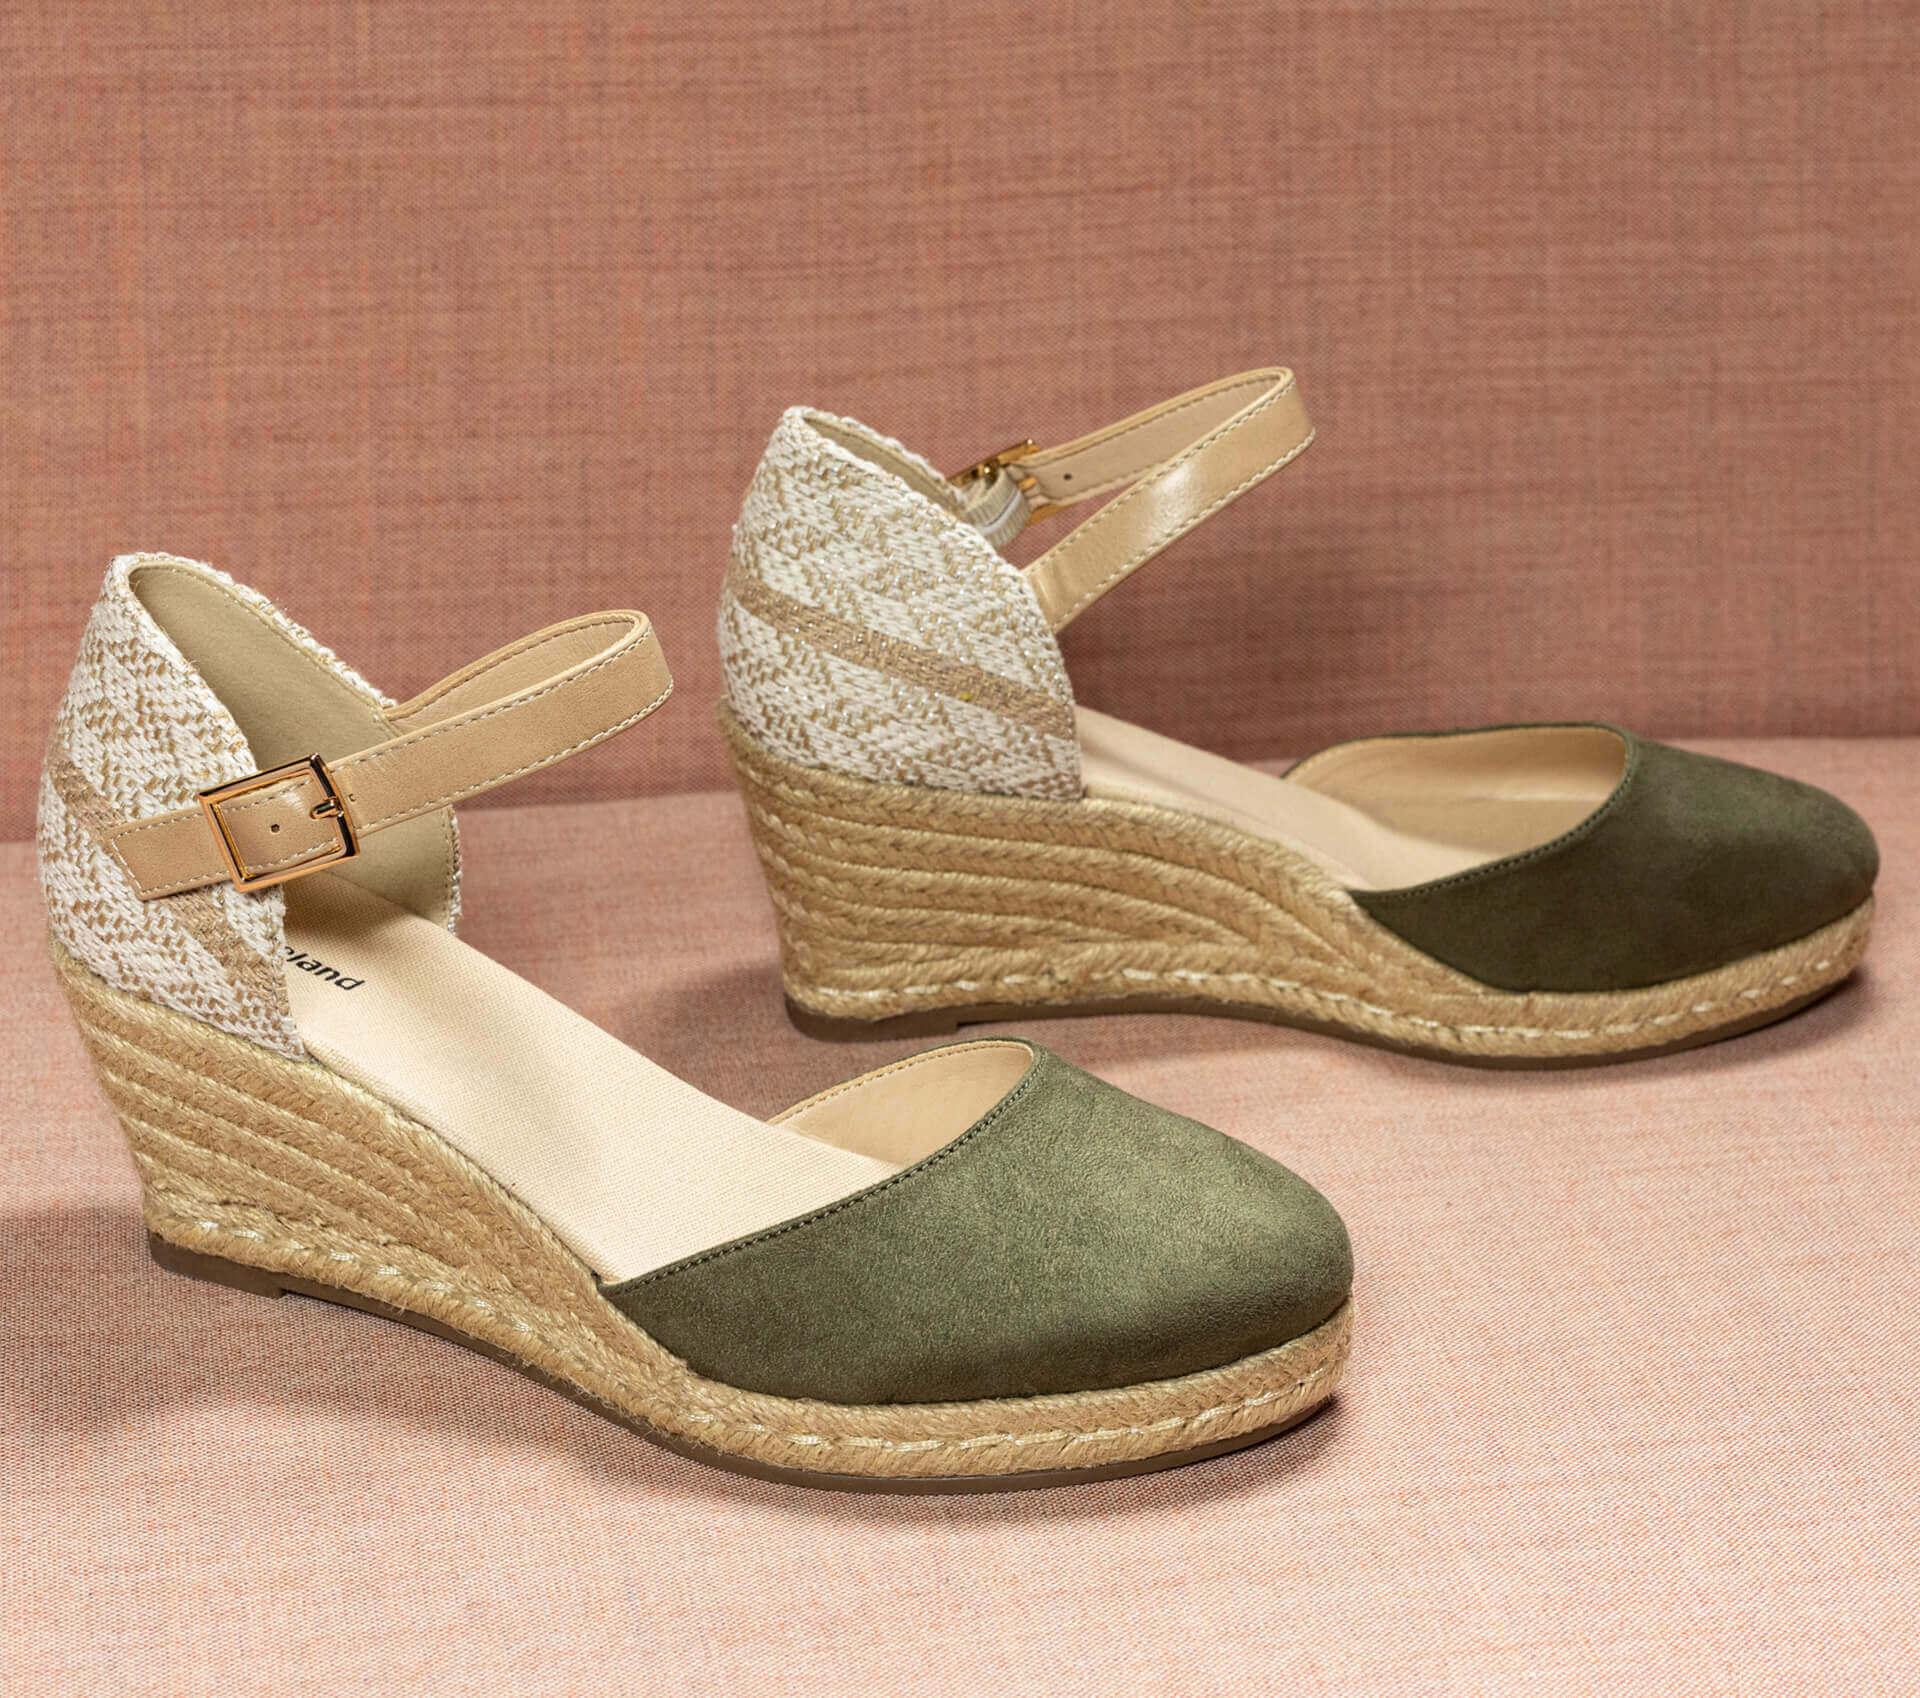 3-Bast-Schuhe-Kachel